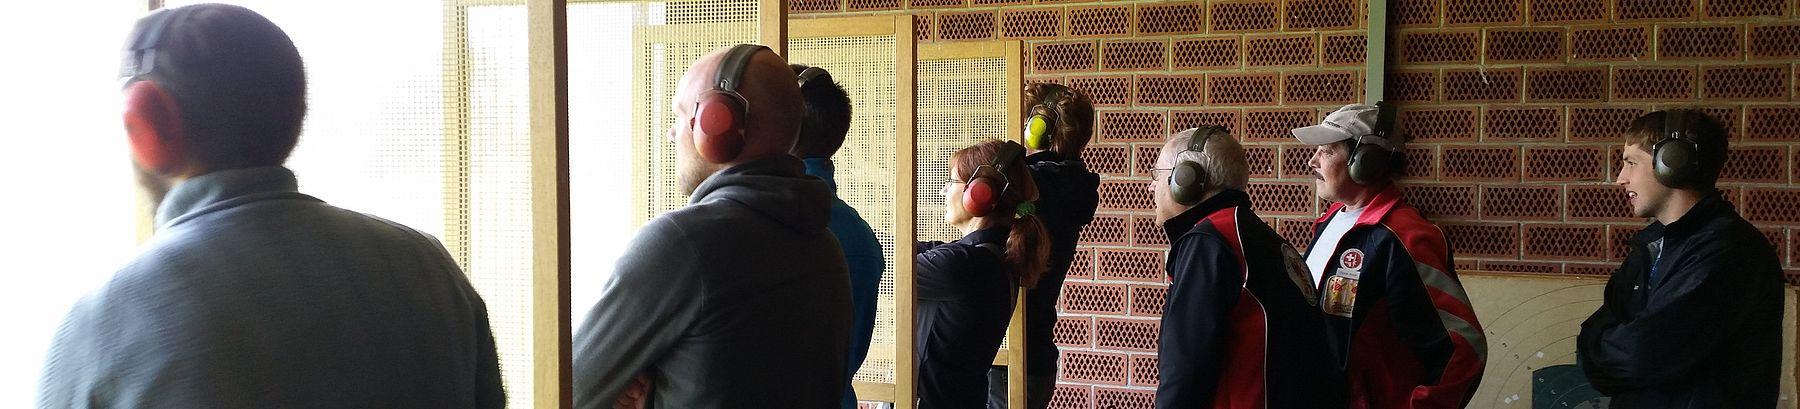 Firmenausflug 2015 - Pistolenschiessstand Bremgarten